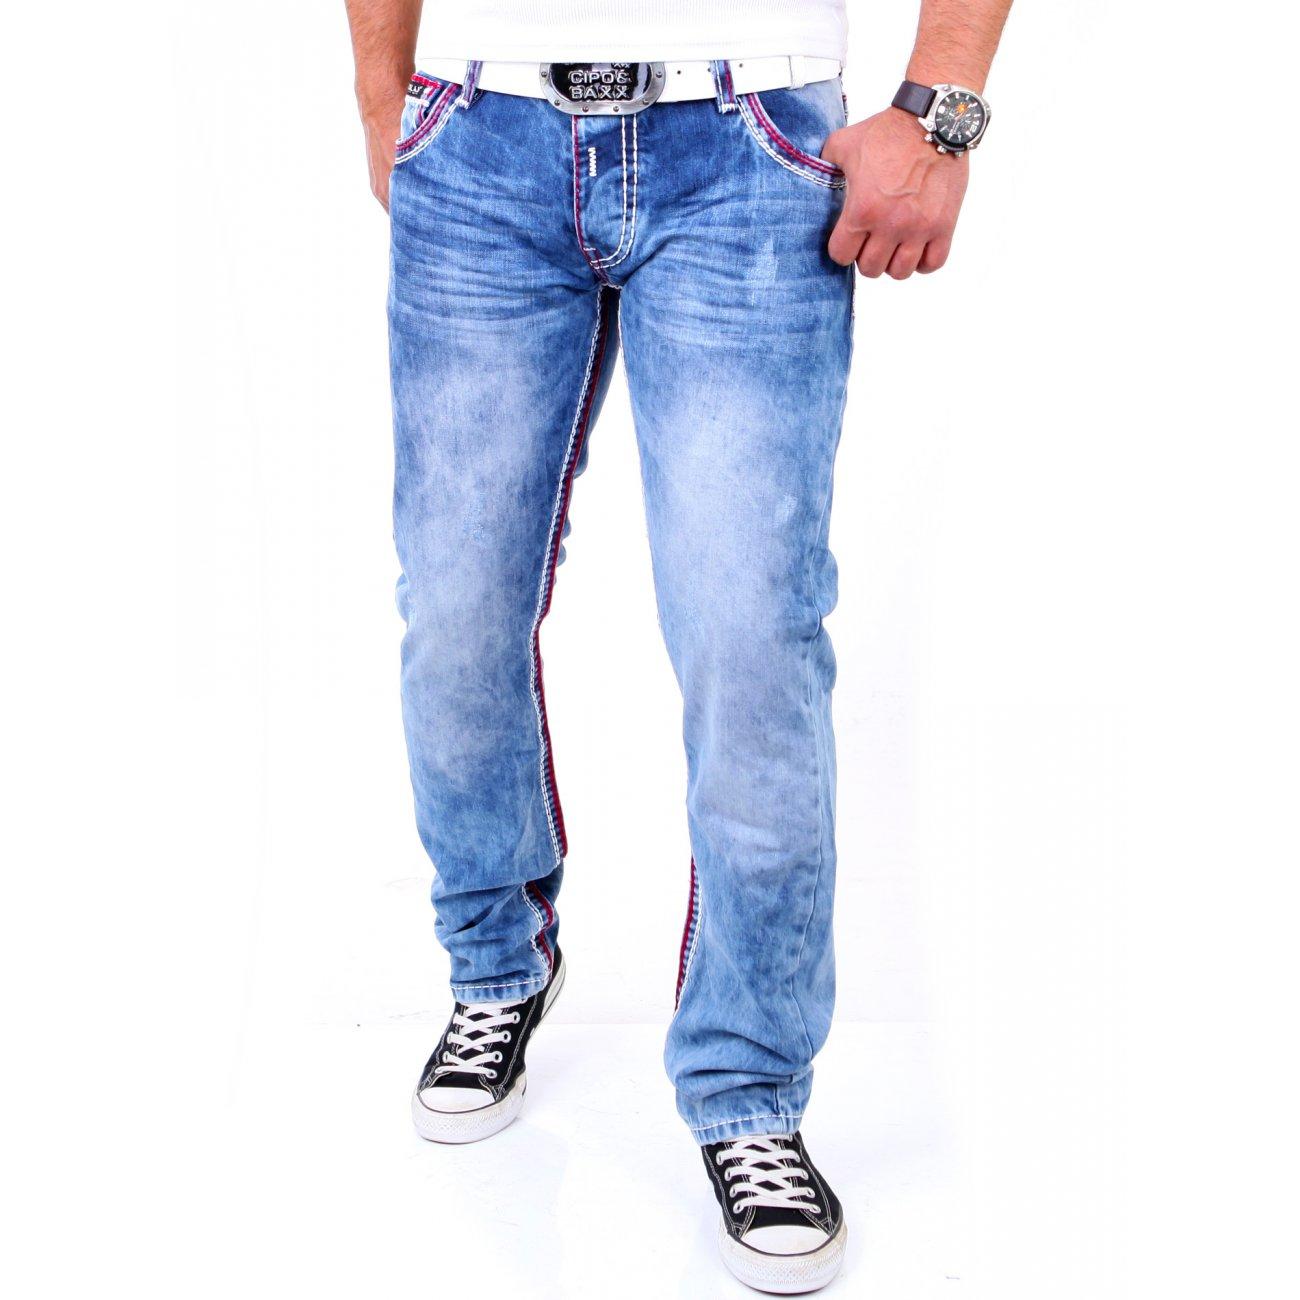 herren jeans mit dicken n hten reslad jeans doppelnaht. Black Bedroom Furniture Sets. Home Design Ideas